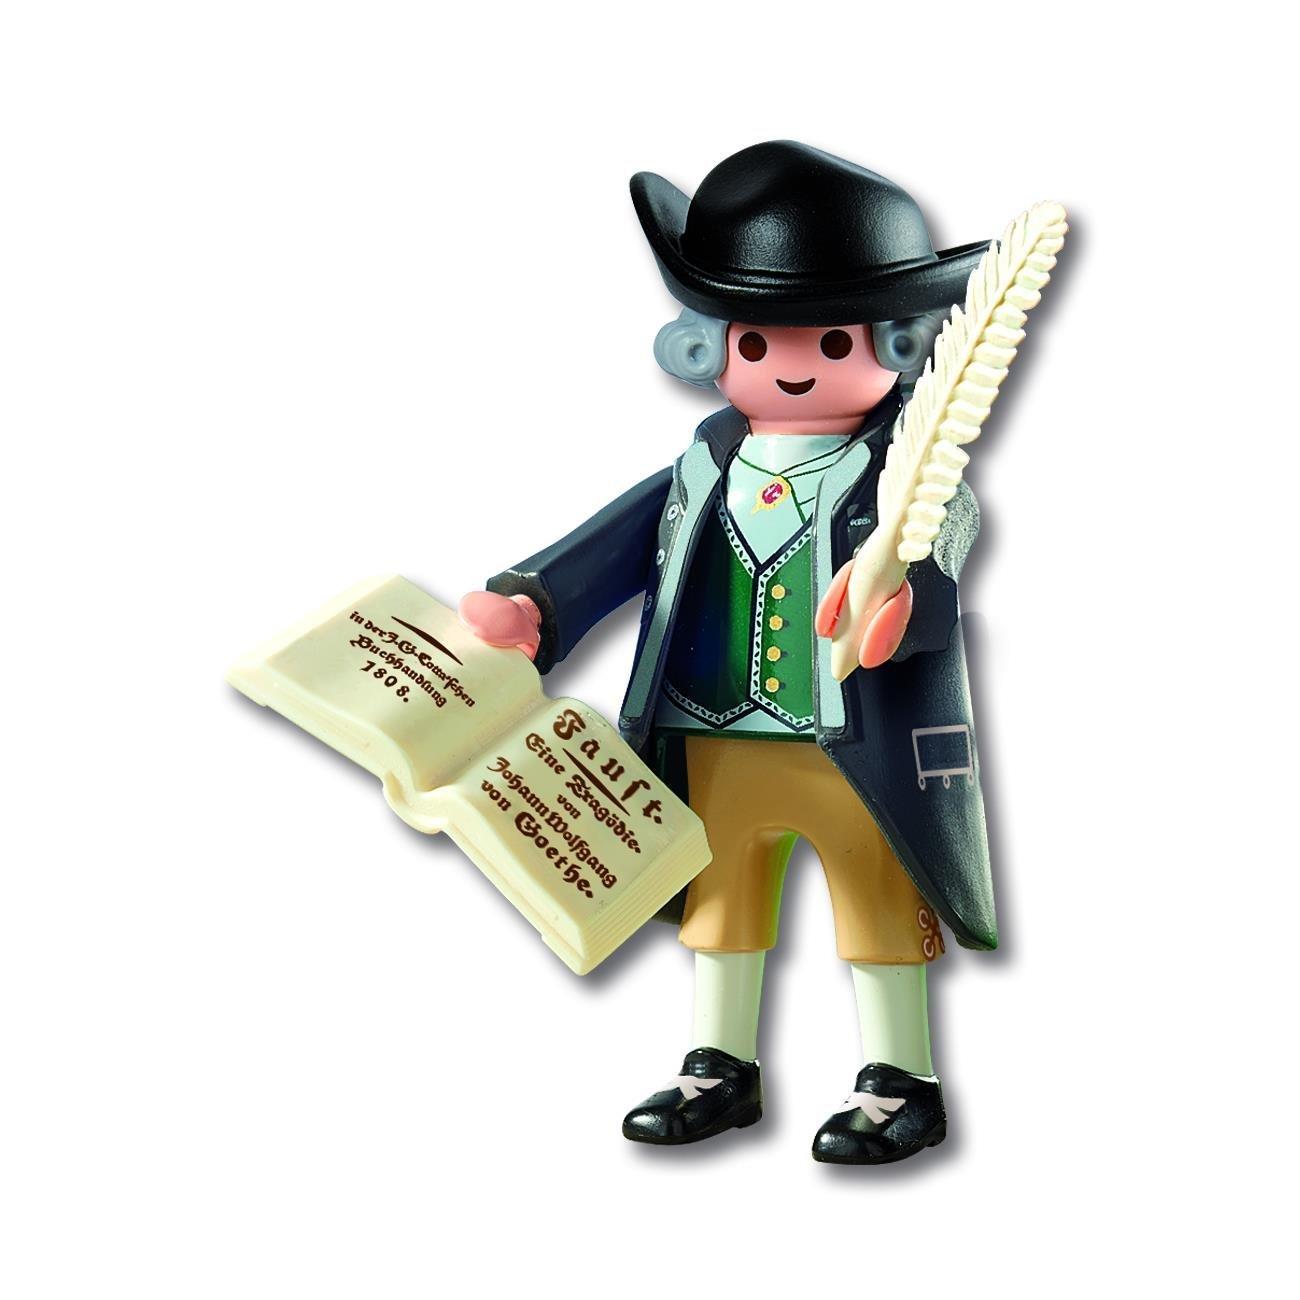 Playmobil 9124 Johann Wolfgang von Goethe: Amazon.co.uk: Toys & Games